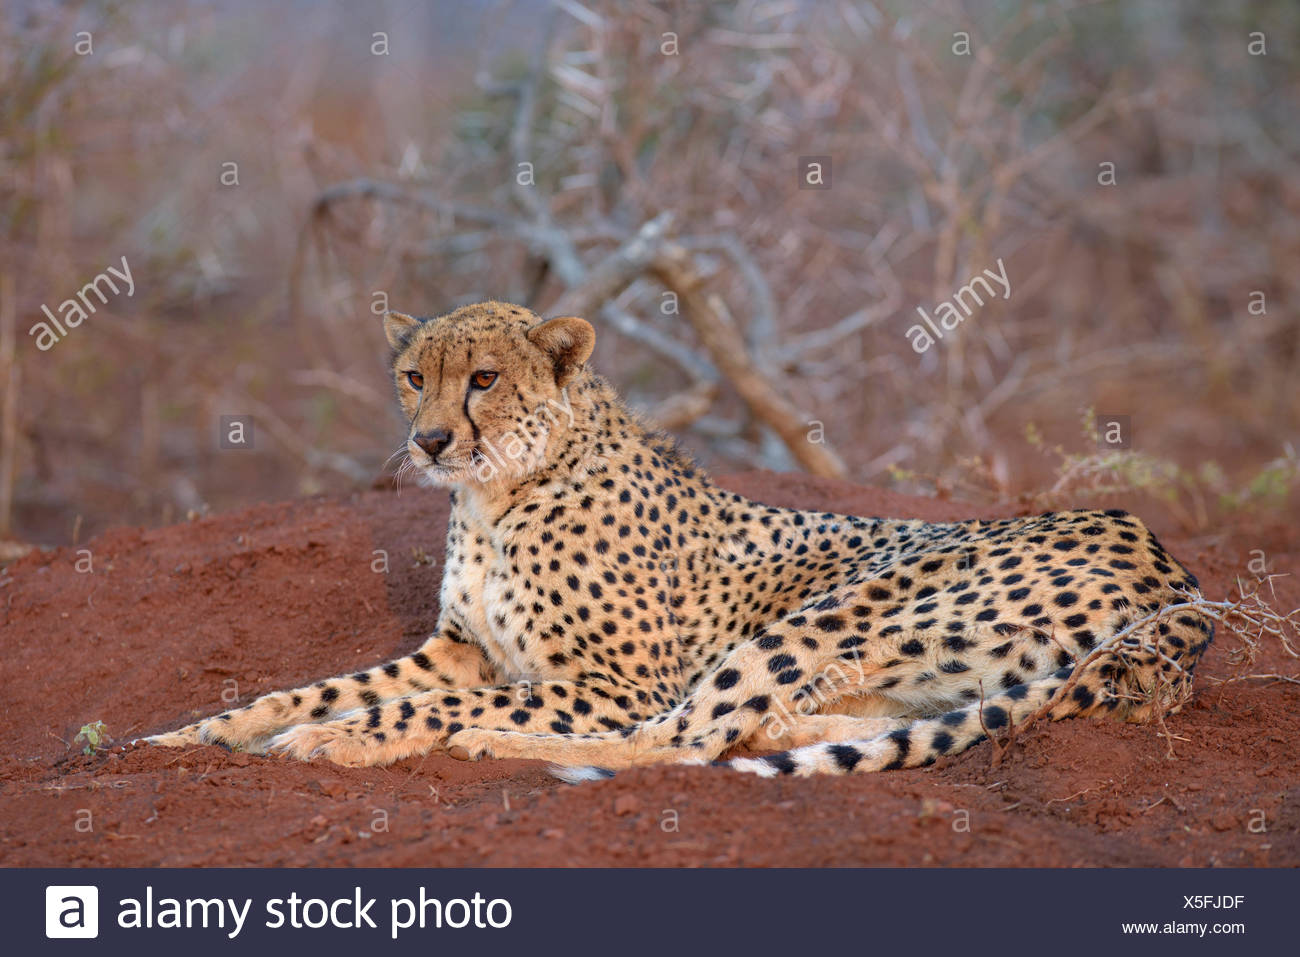 Ruhenden Erwachsenen weiblichen Gepard (Acinonyx Jubatus), Zimanga Private Game Reserve, KwaZulu-Natal, Südafrika Stockfoto